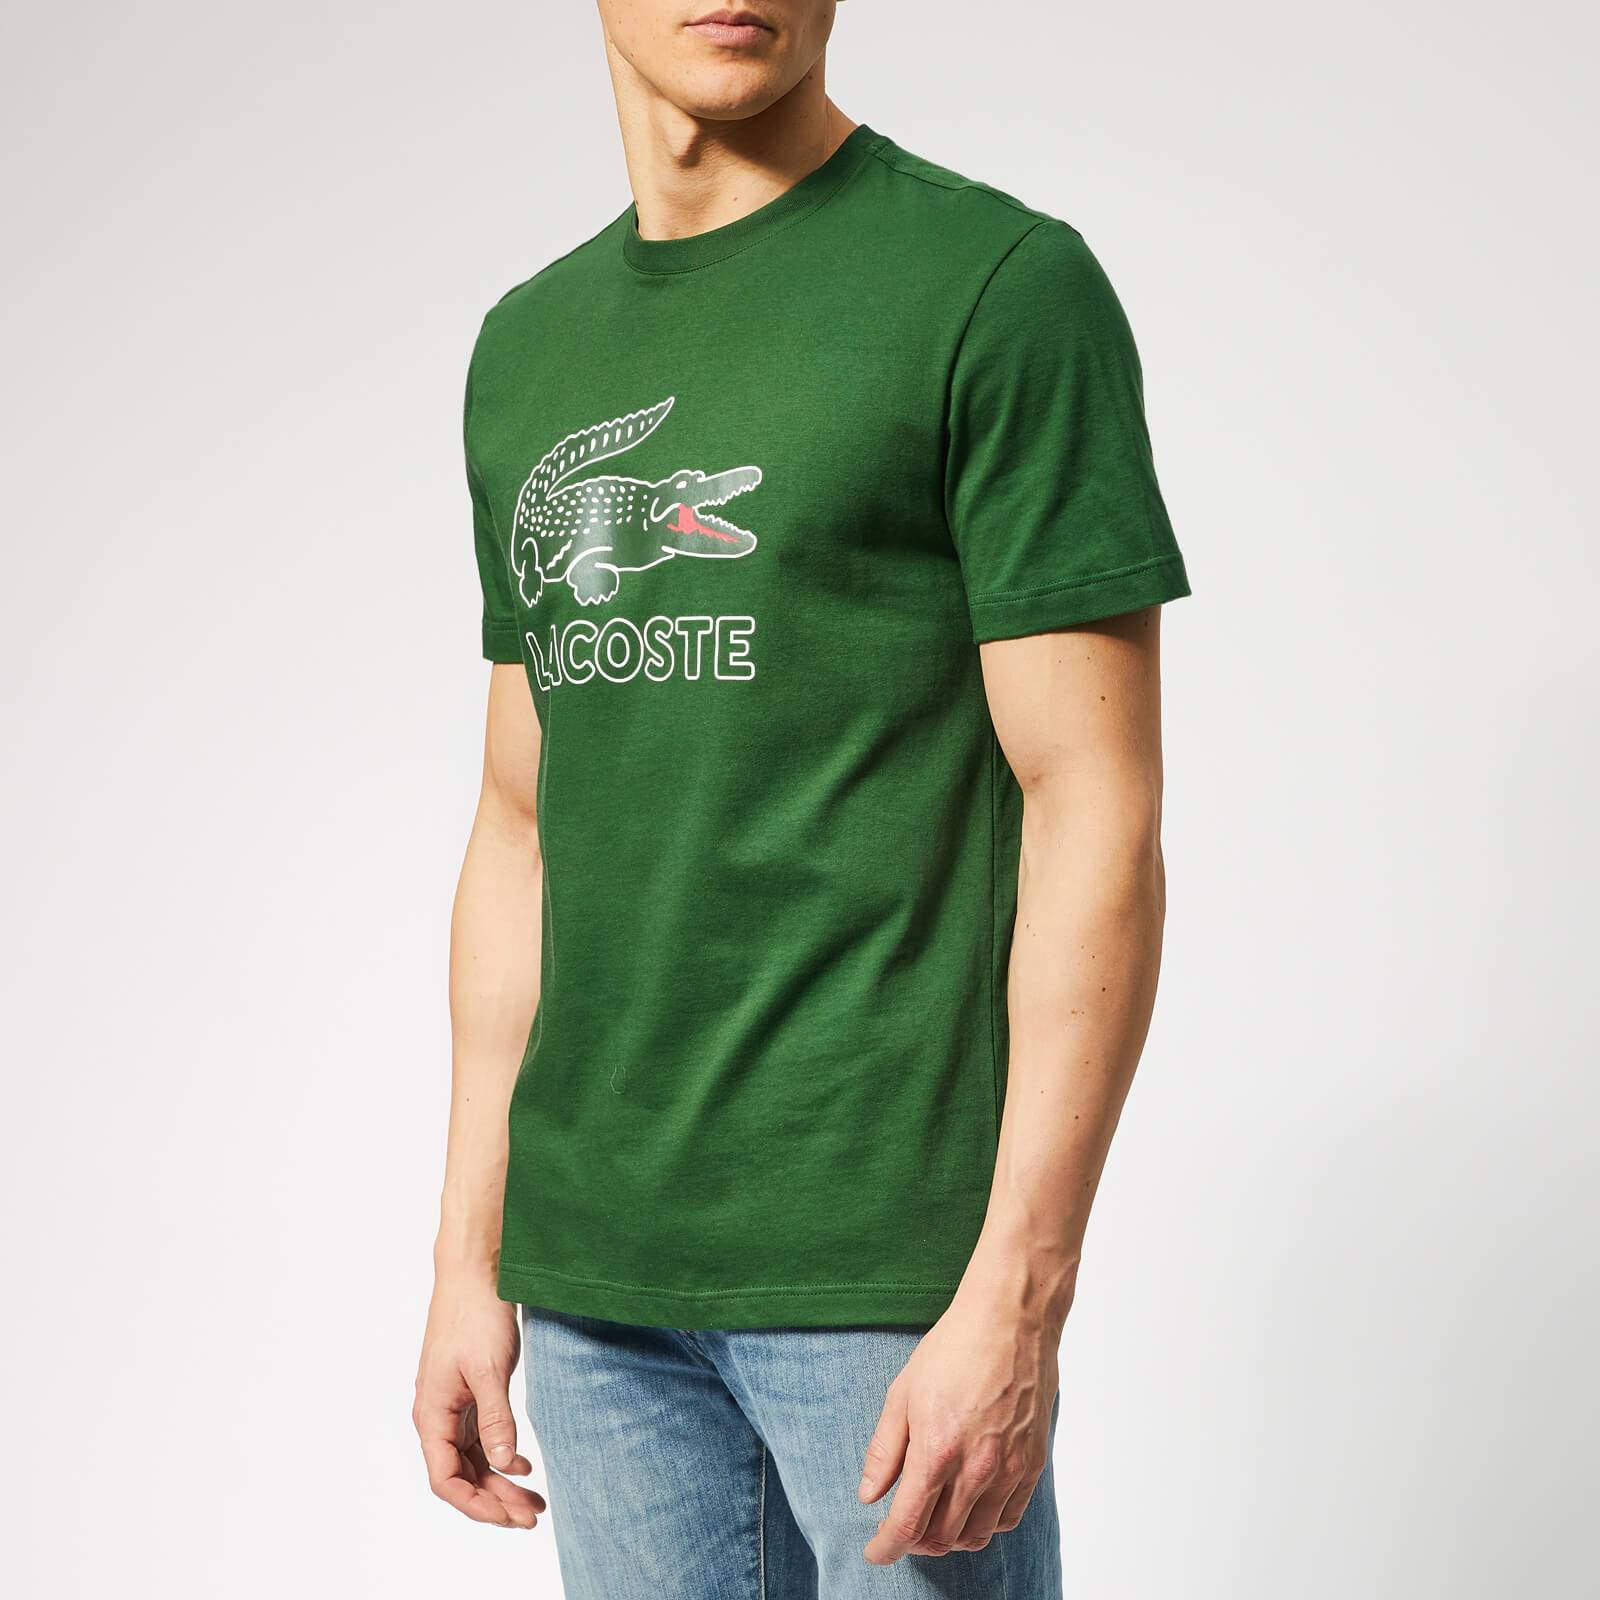 Lacoste Men's Large Logo T-Shirt - Green - 4/M - Green